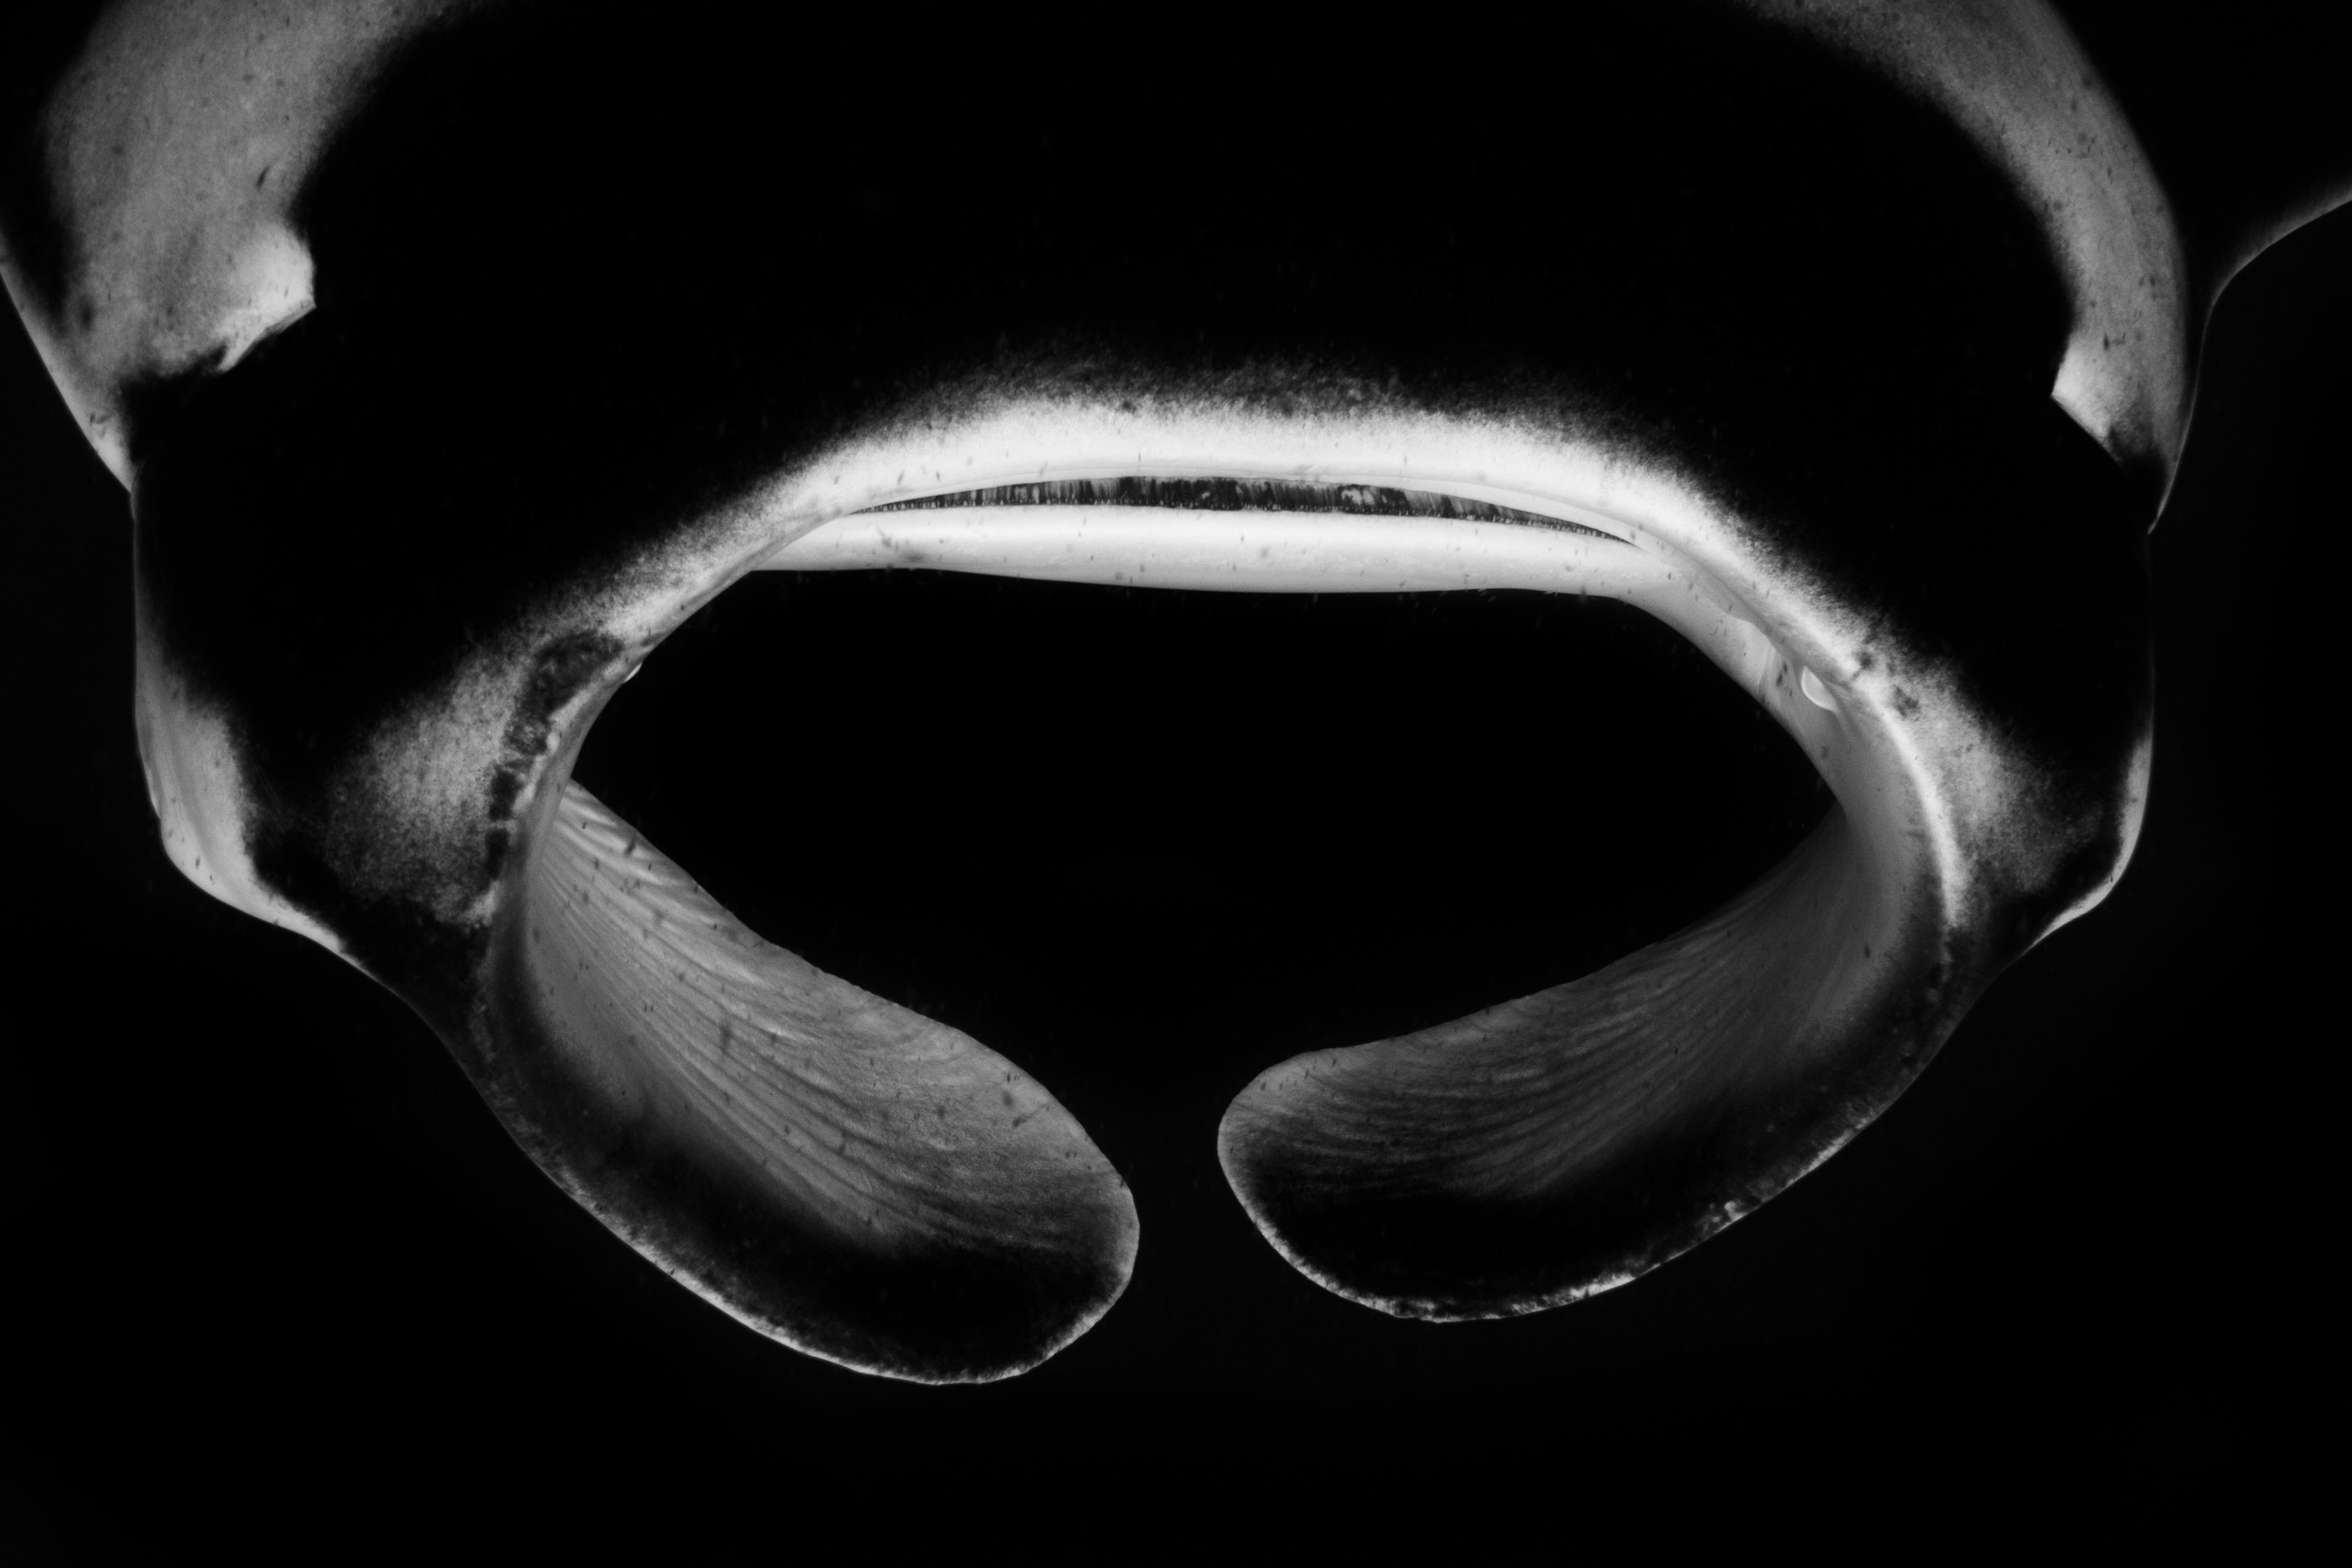 Cephalic fins